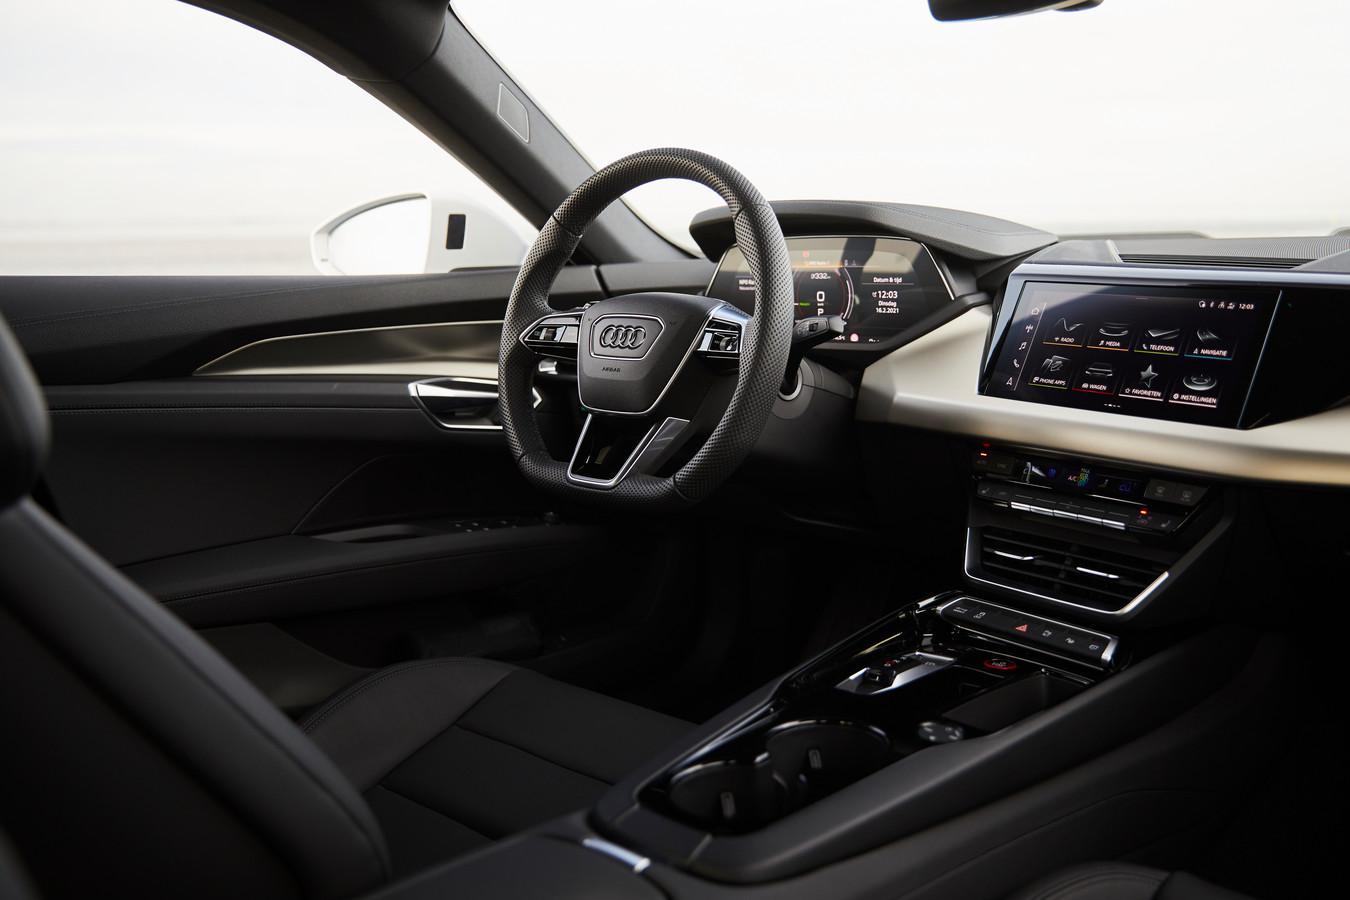 Minder excentriek, wel goed ontworpen: de cockpit van de Audi e-Tron GT